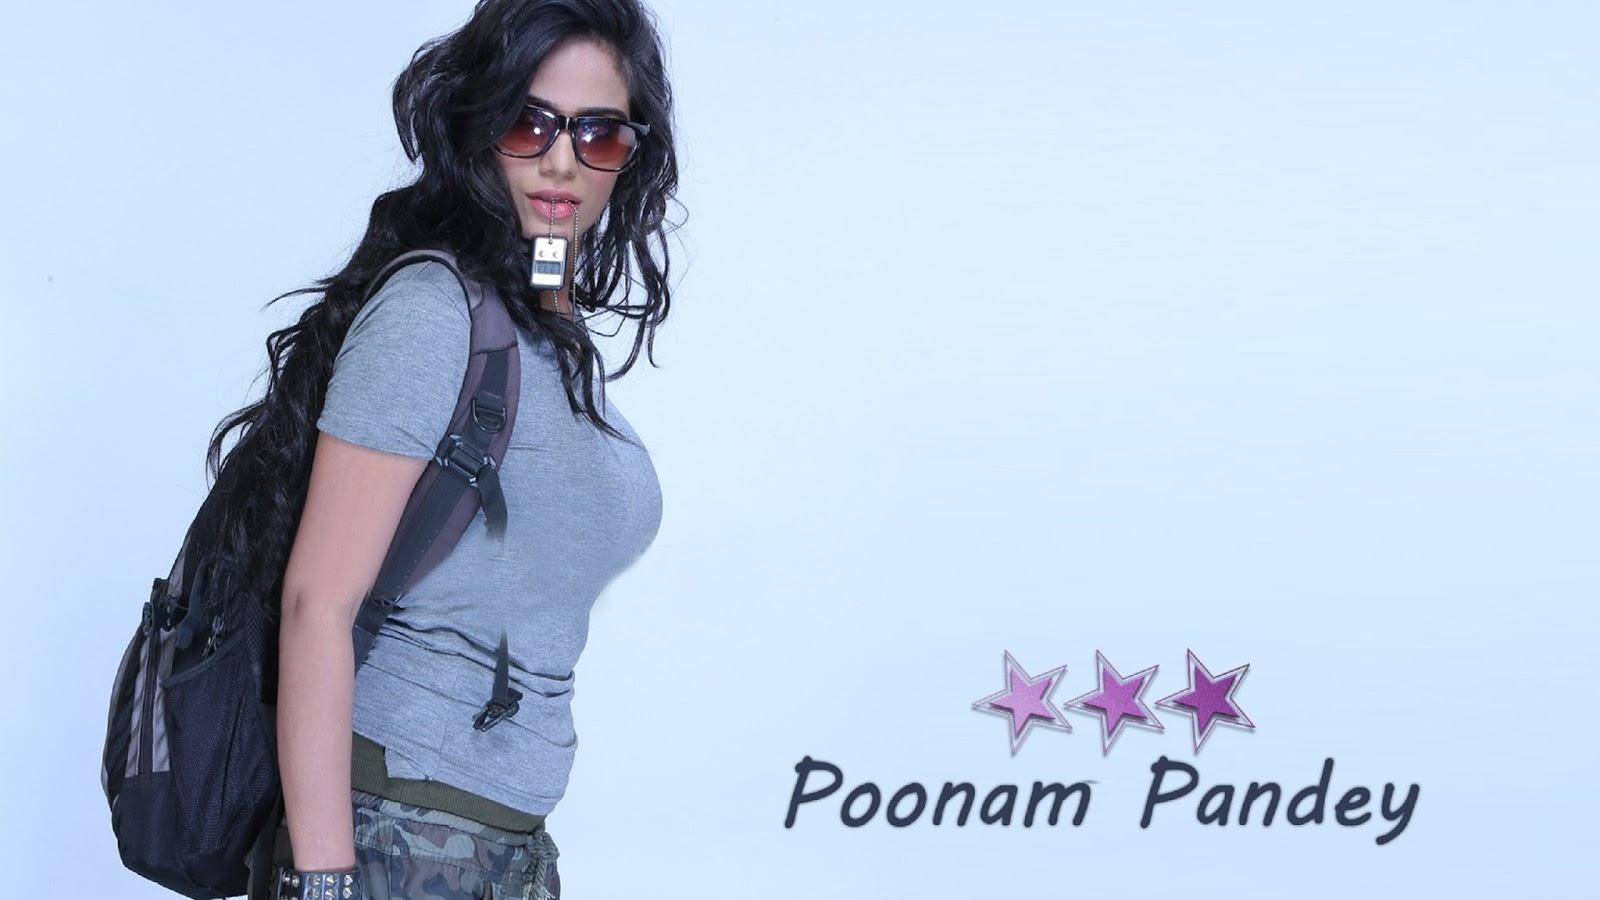 poonam pandey wallpapers new